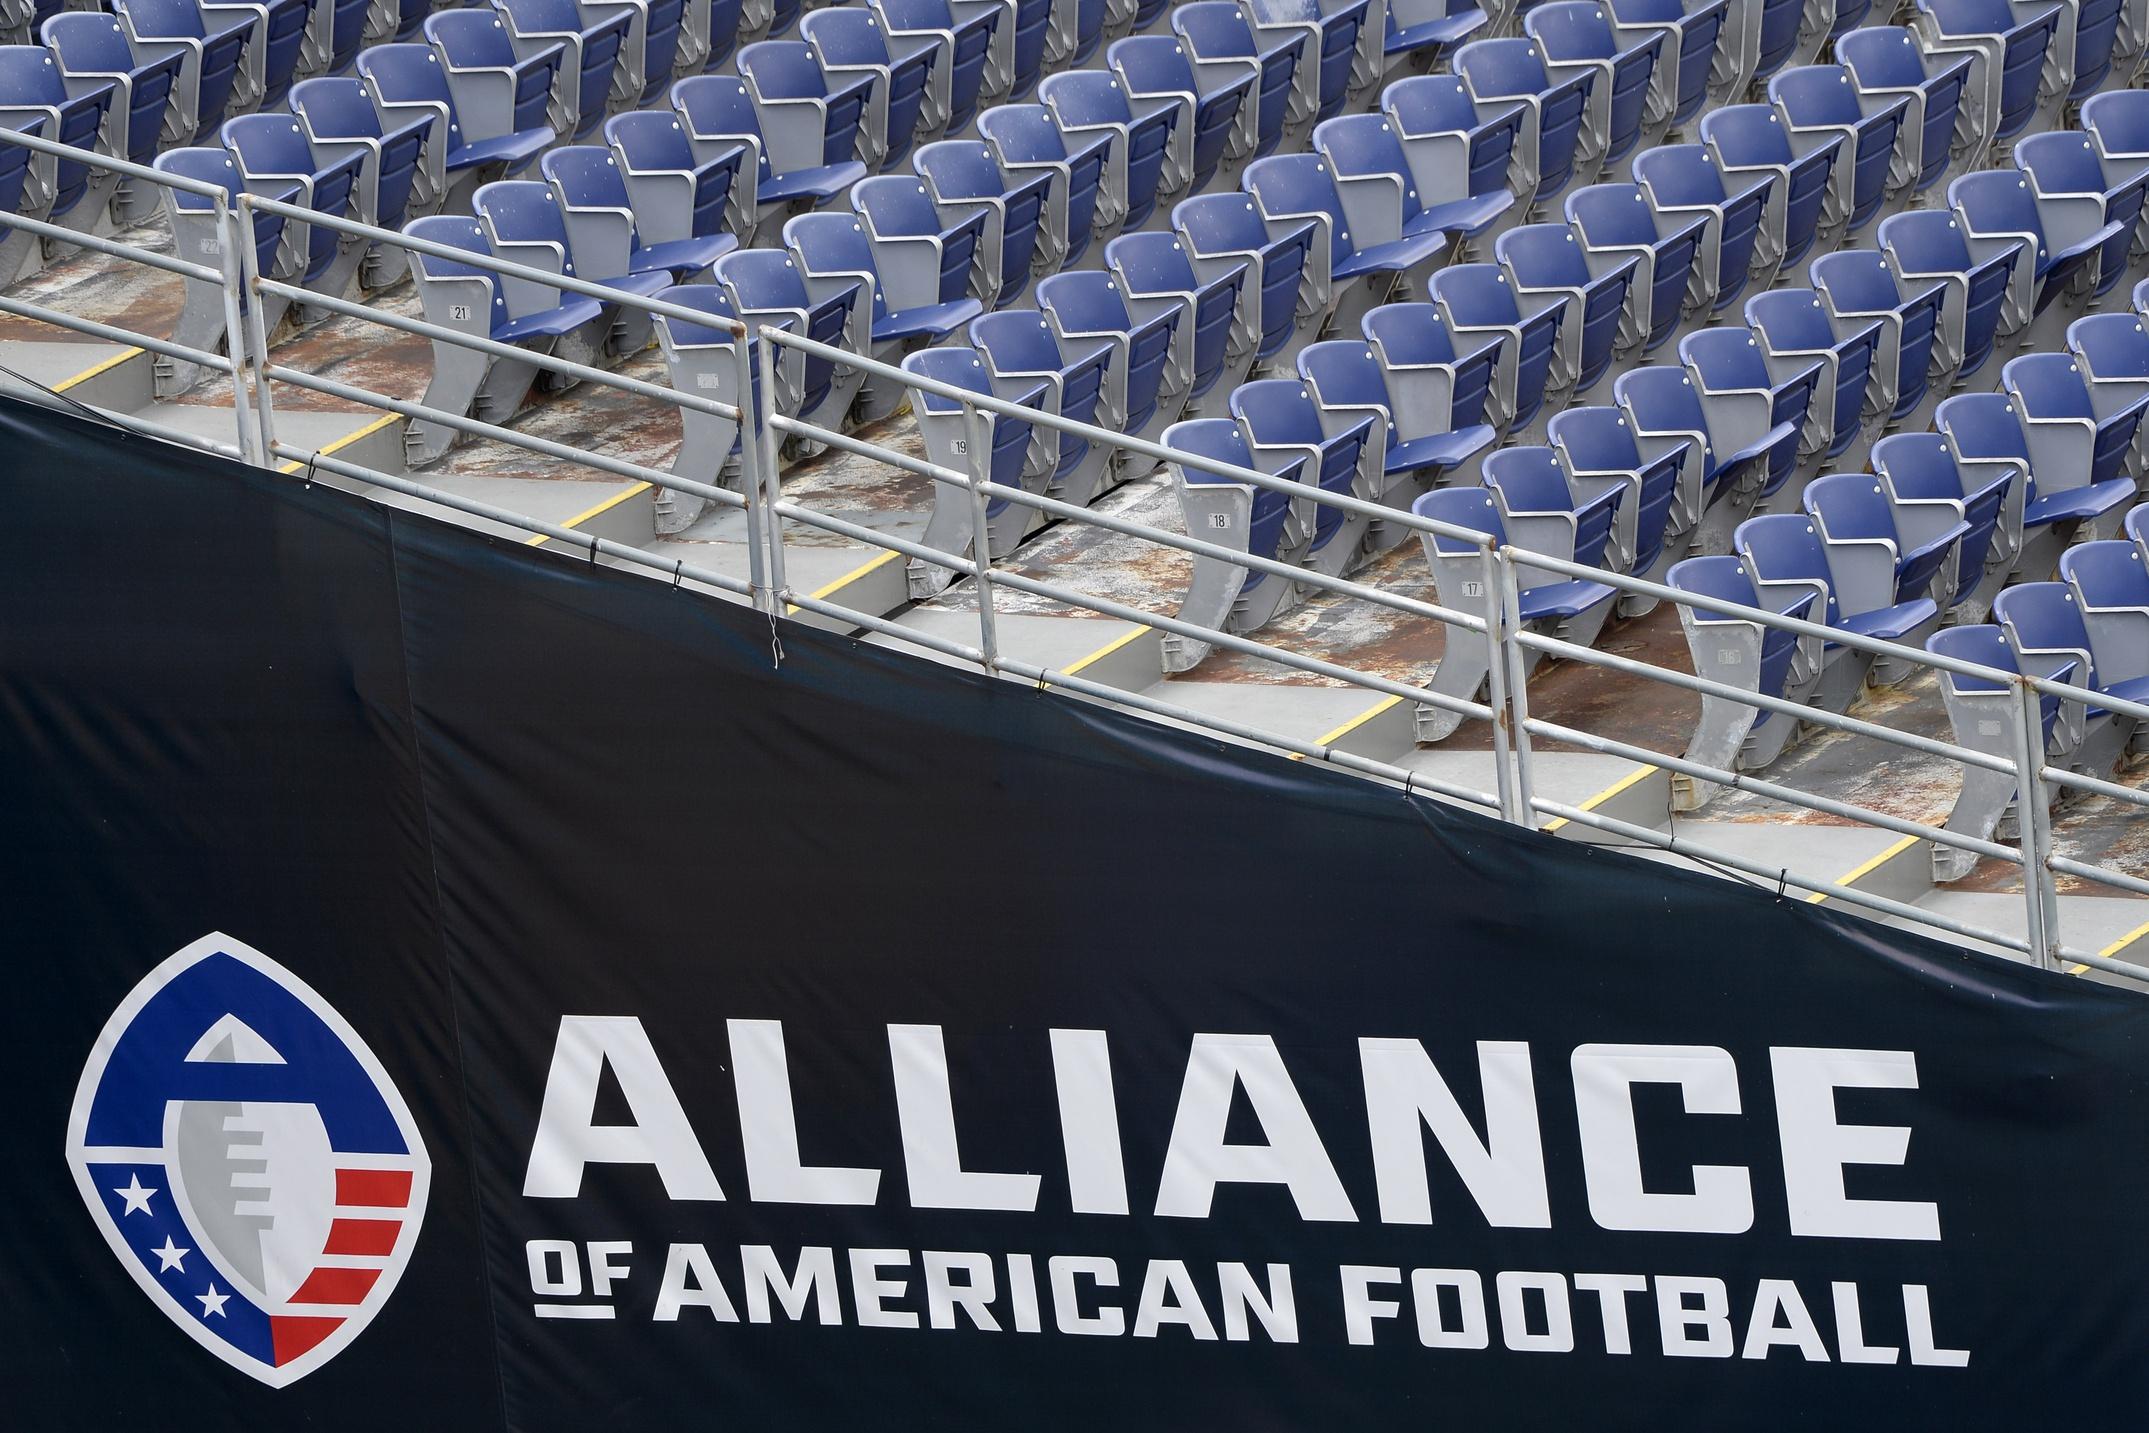 XFL releases statement over AAF closure